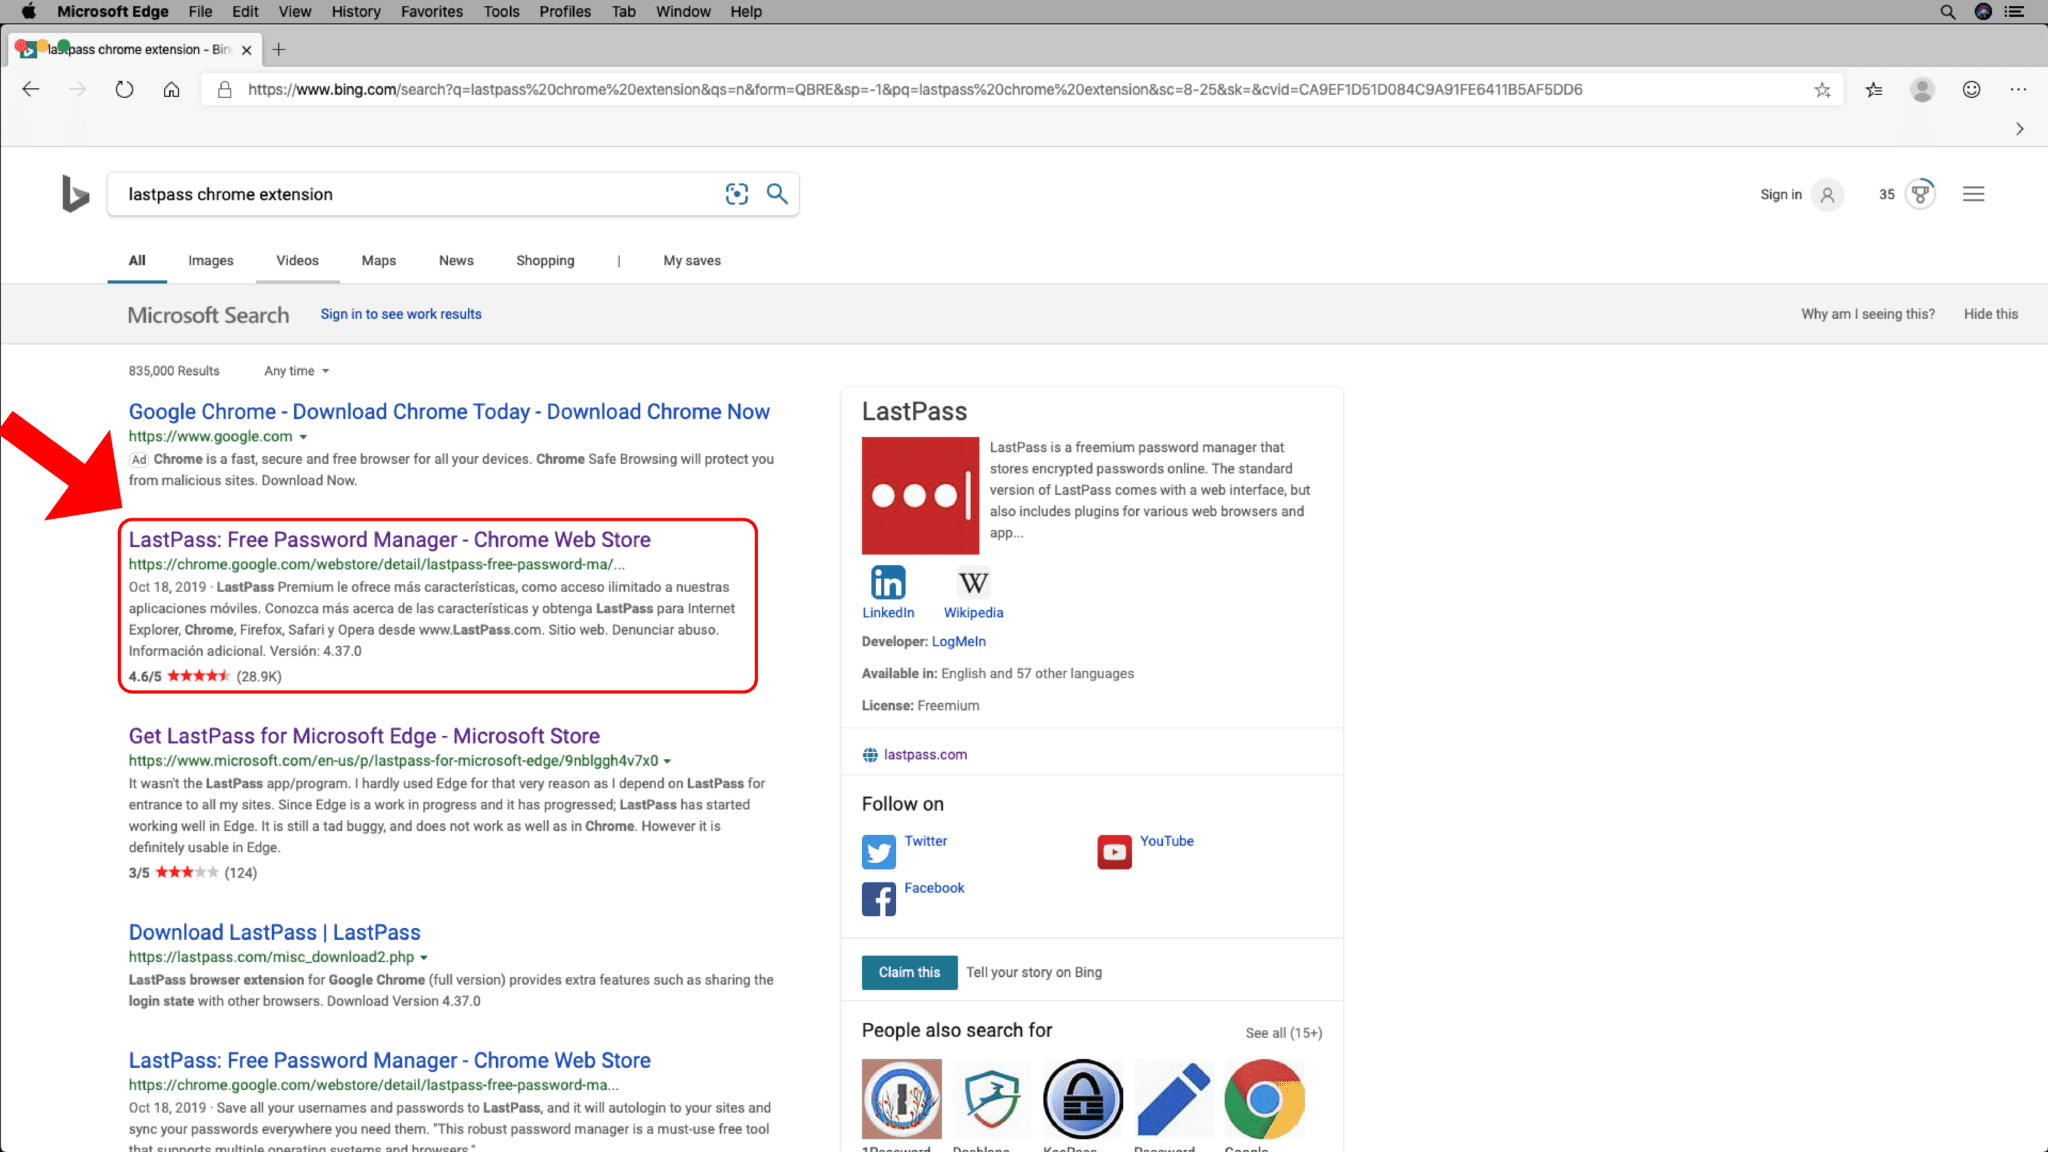 Microsoft Edge - Add Chrome Extensions - Step 3